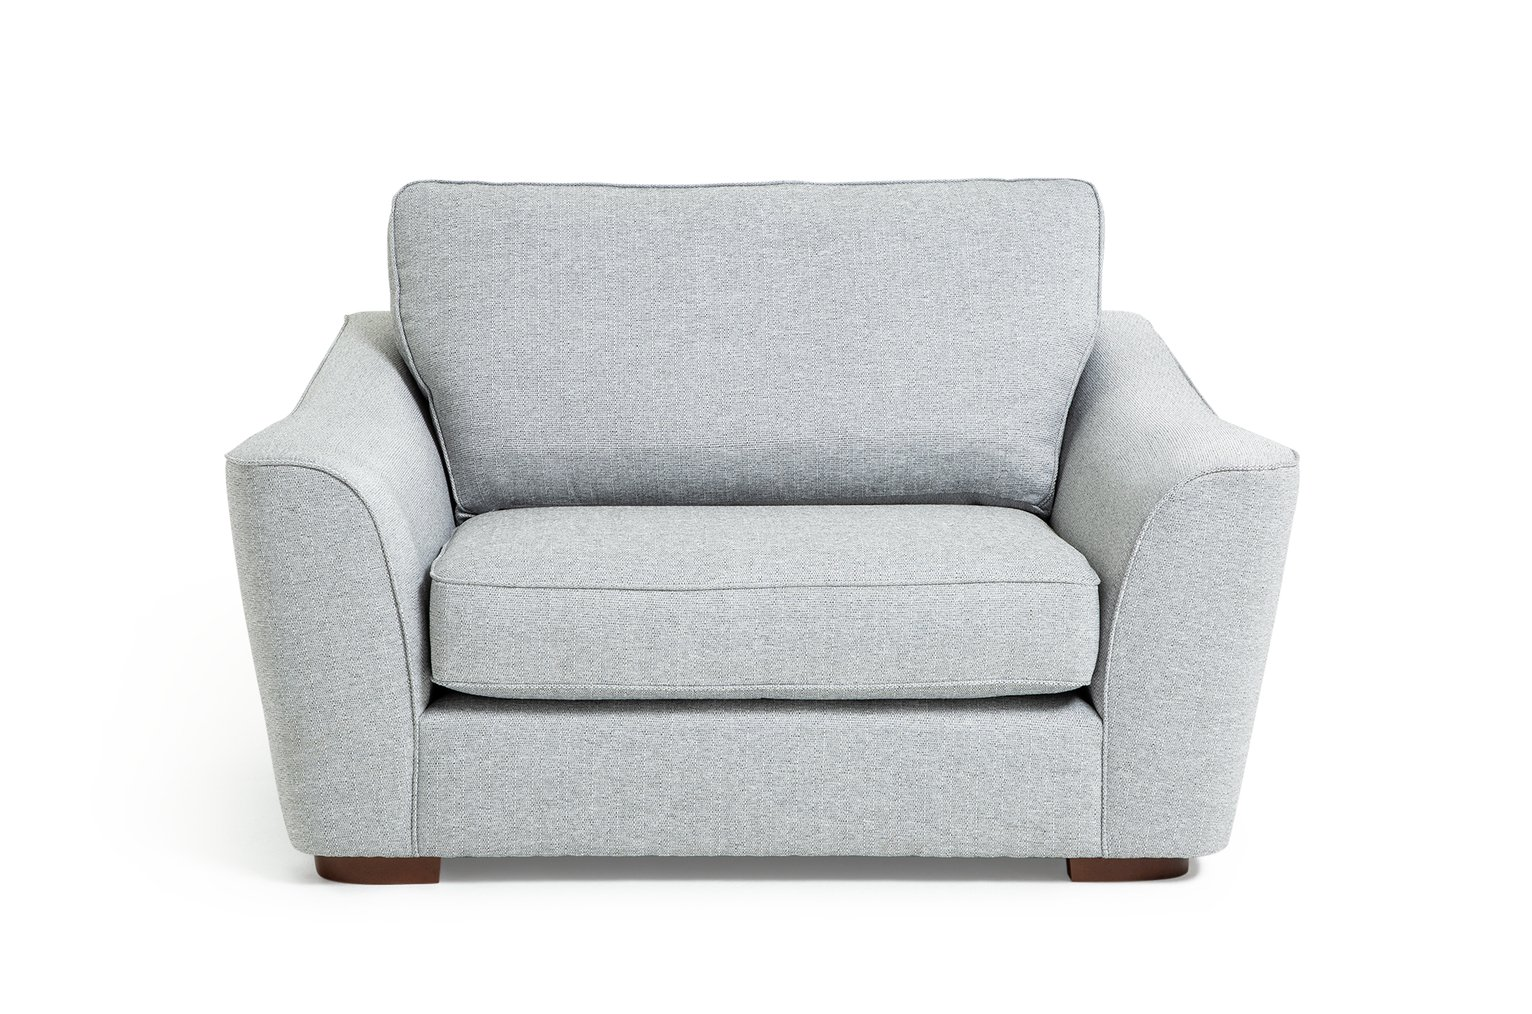 Argos Home Lotus Fabric Cuddle Chair - Silver